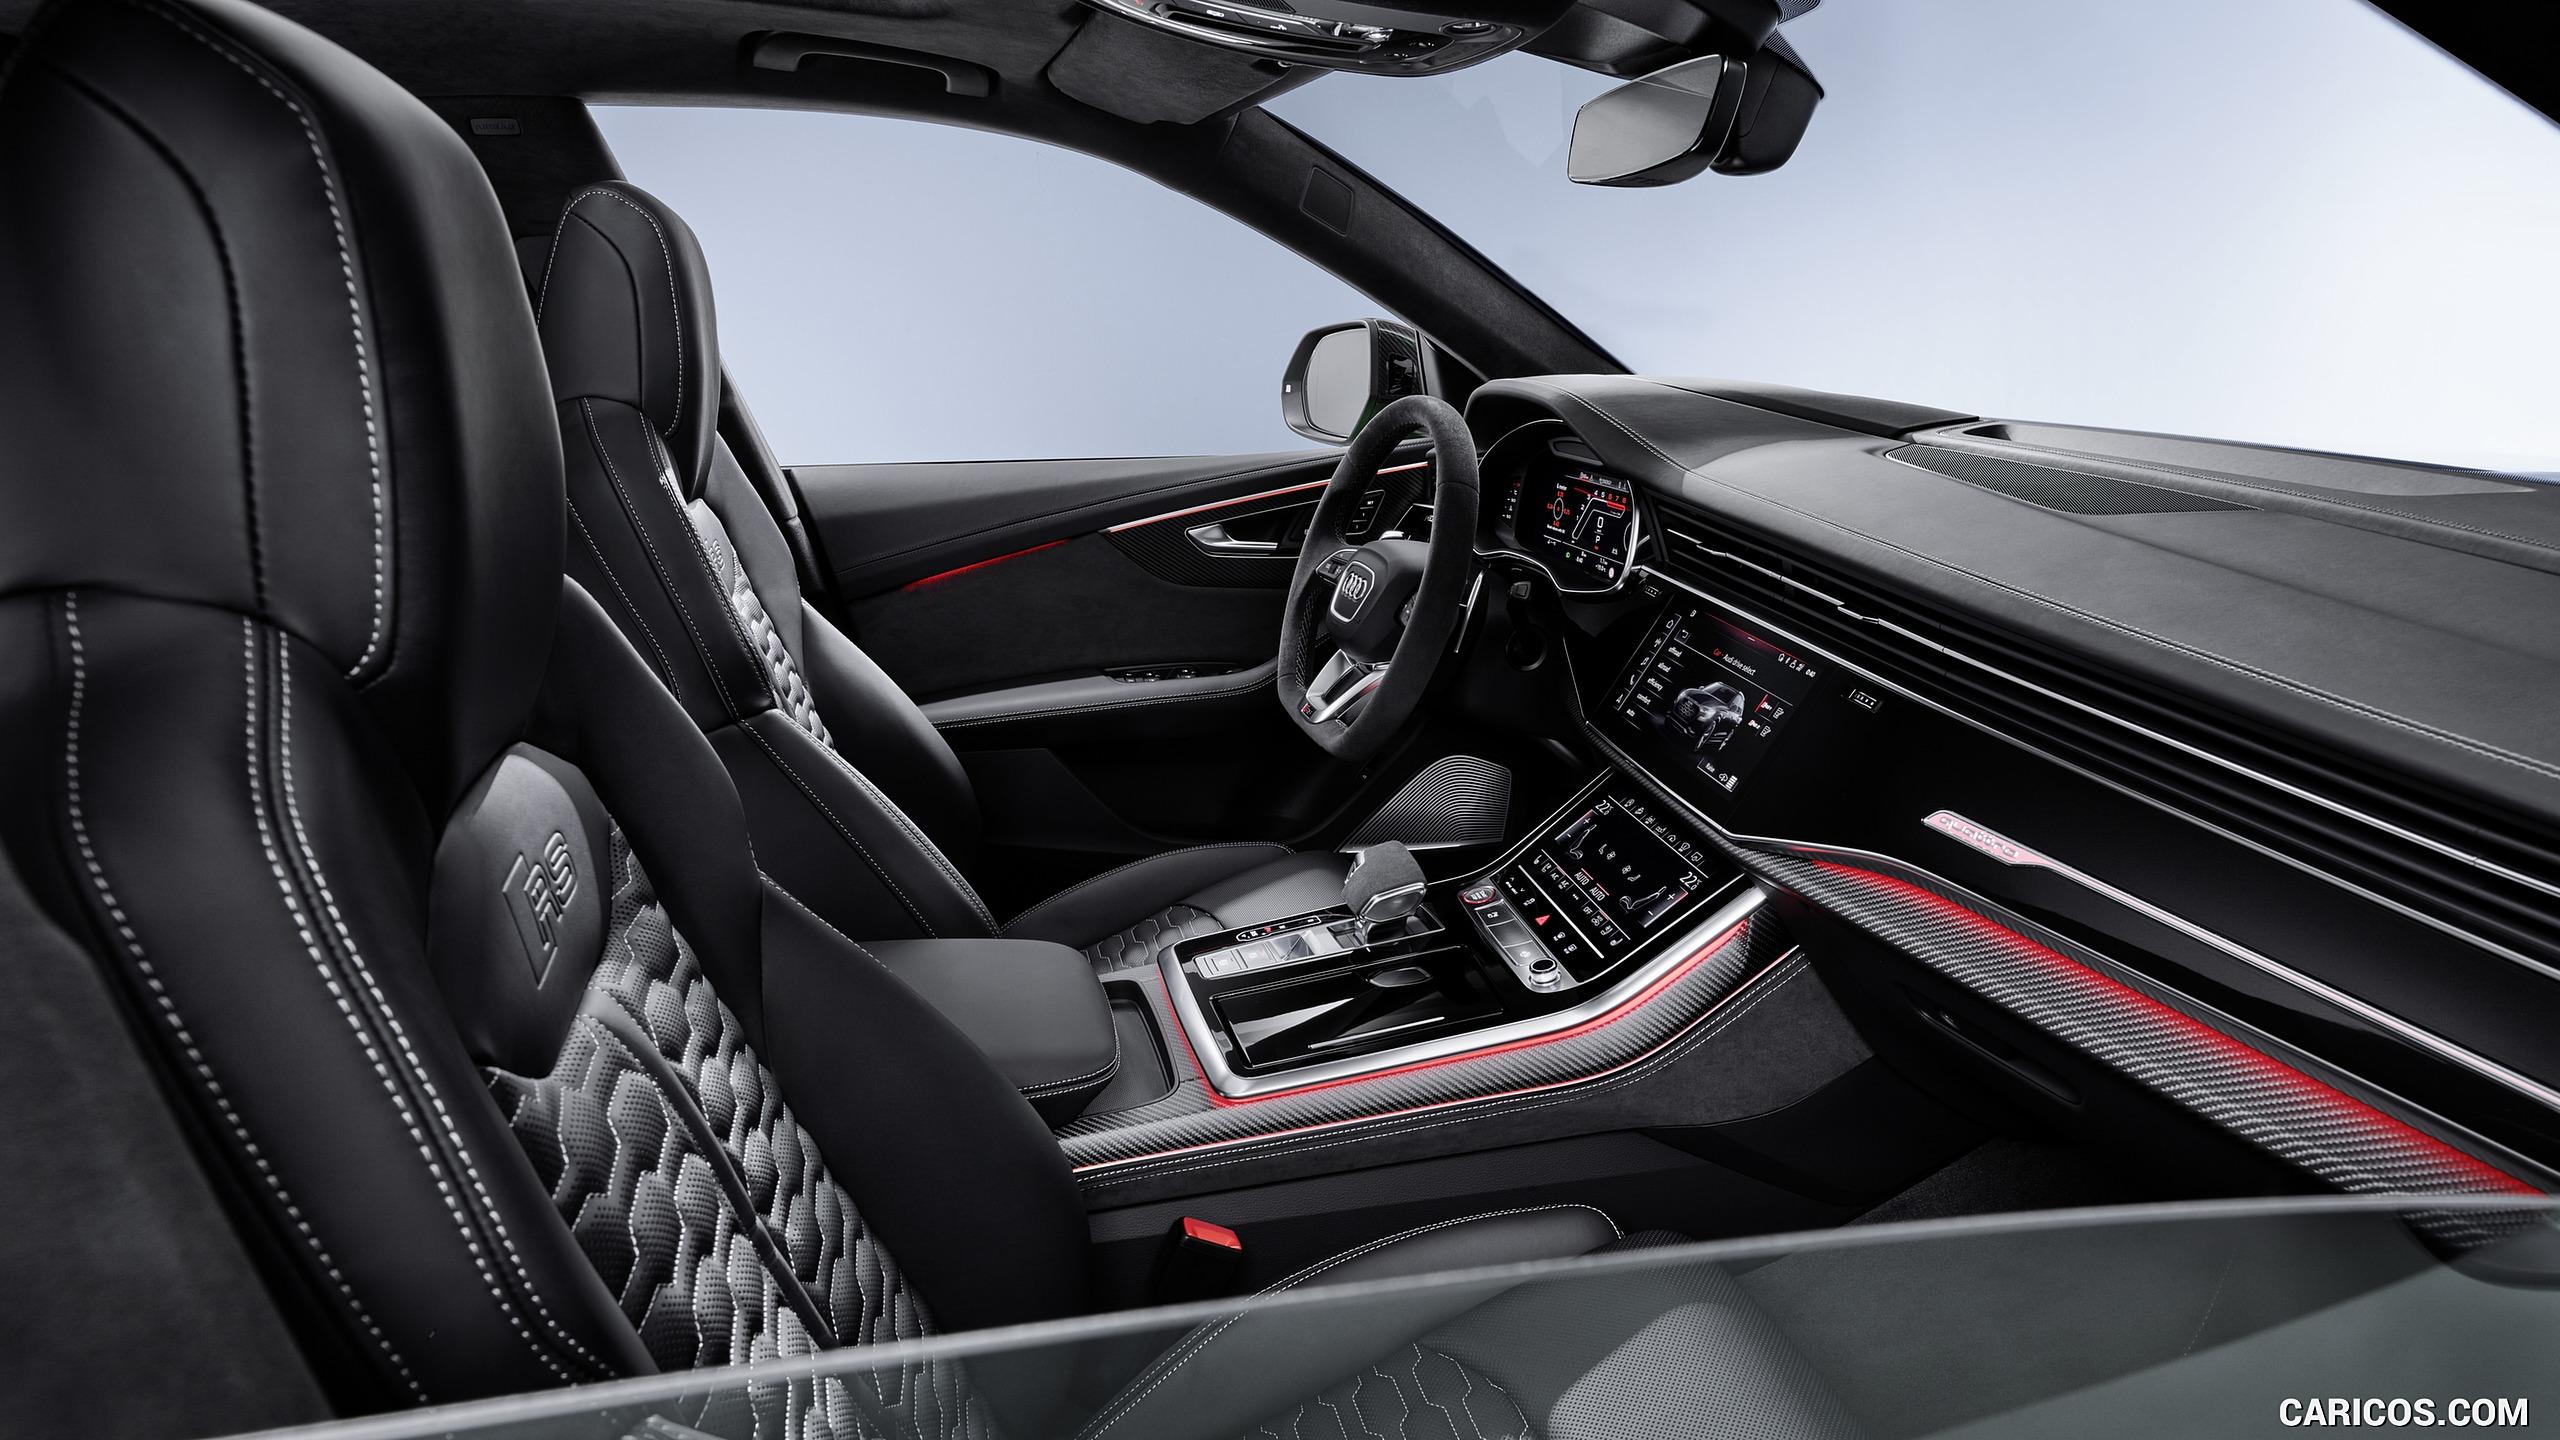 2020 Audi RS Q8   Detail HD Wallpaper 12 2560x1440